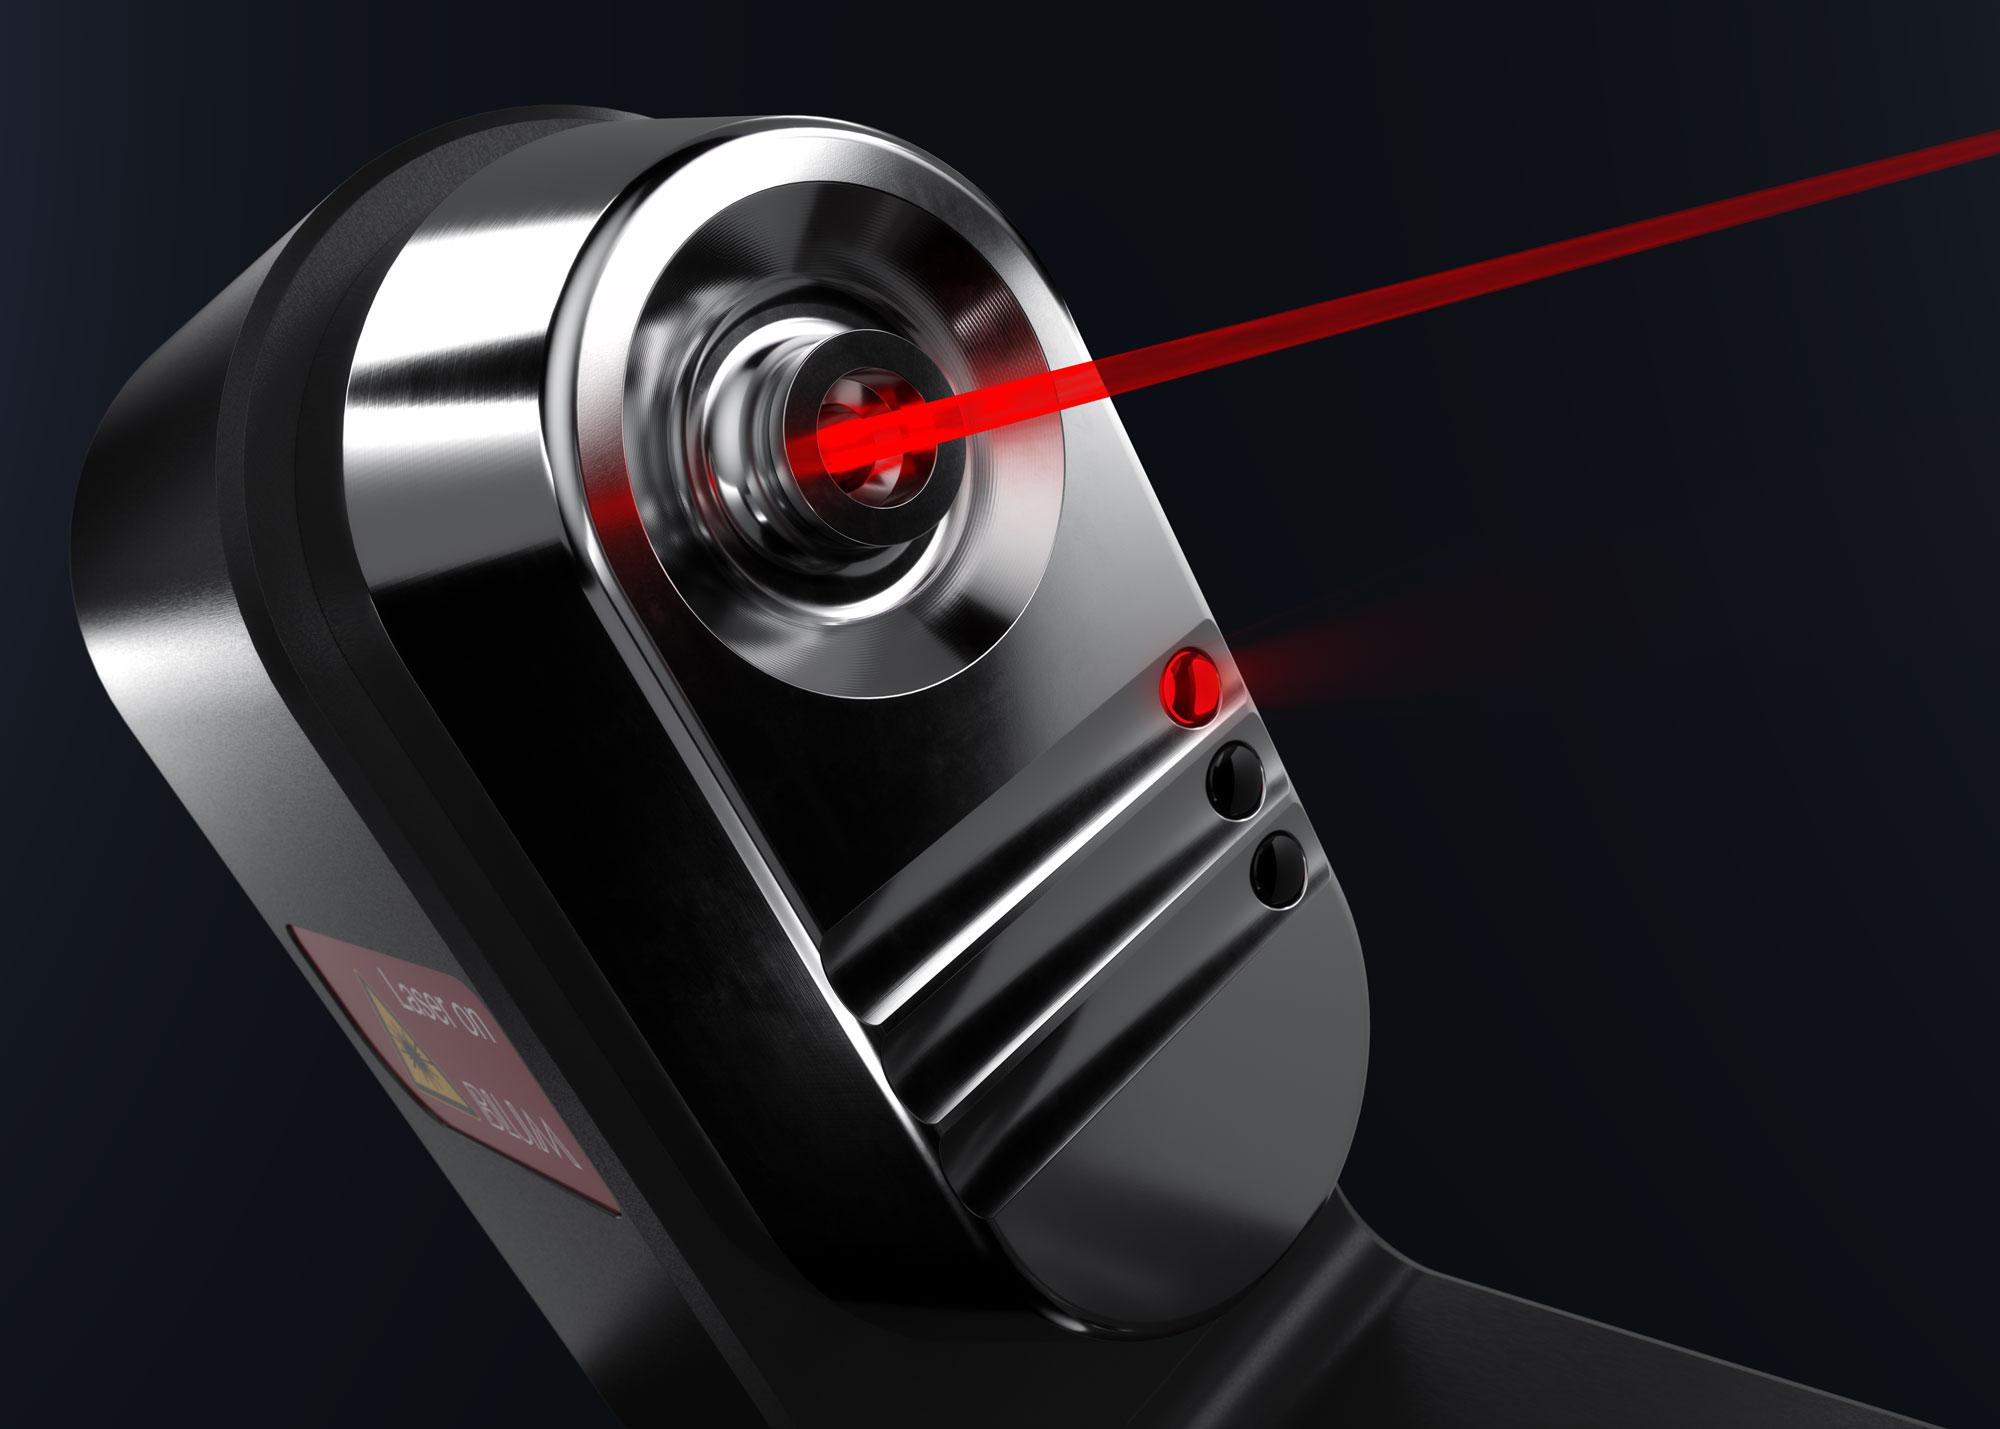 Lasermesssystem